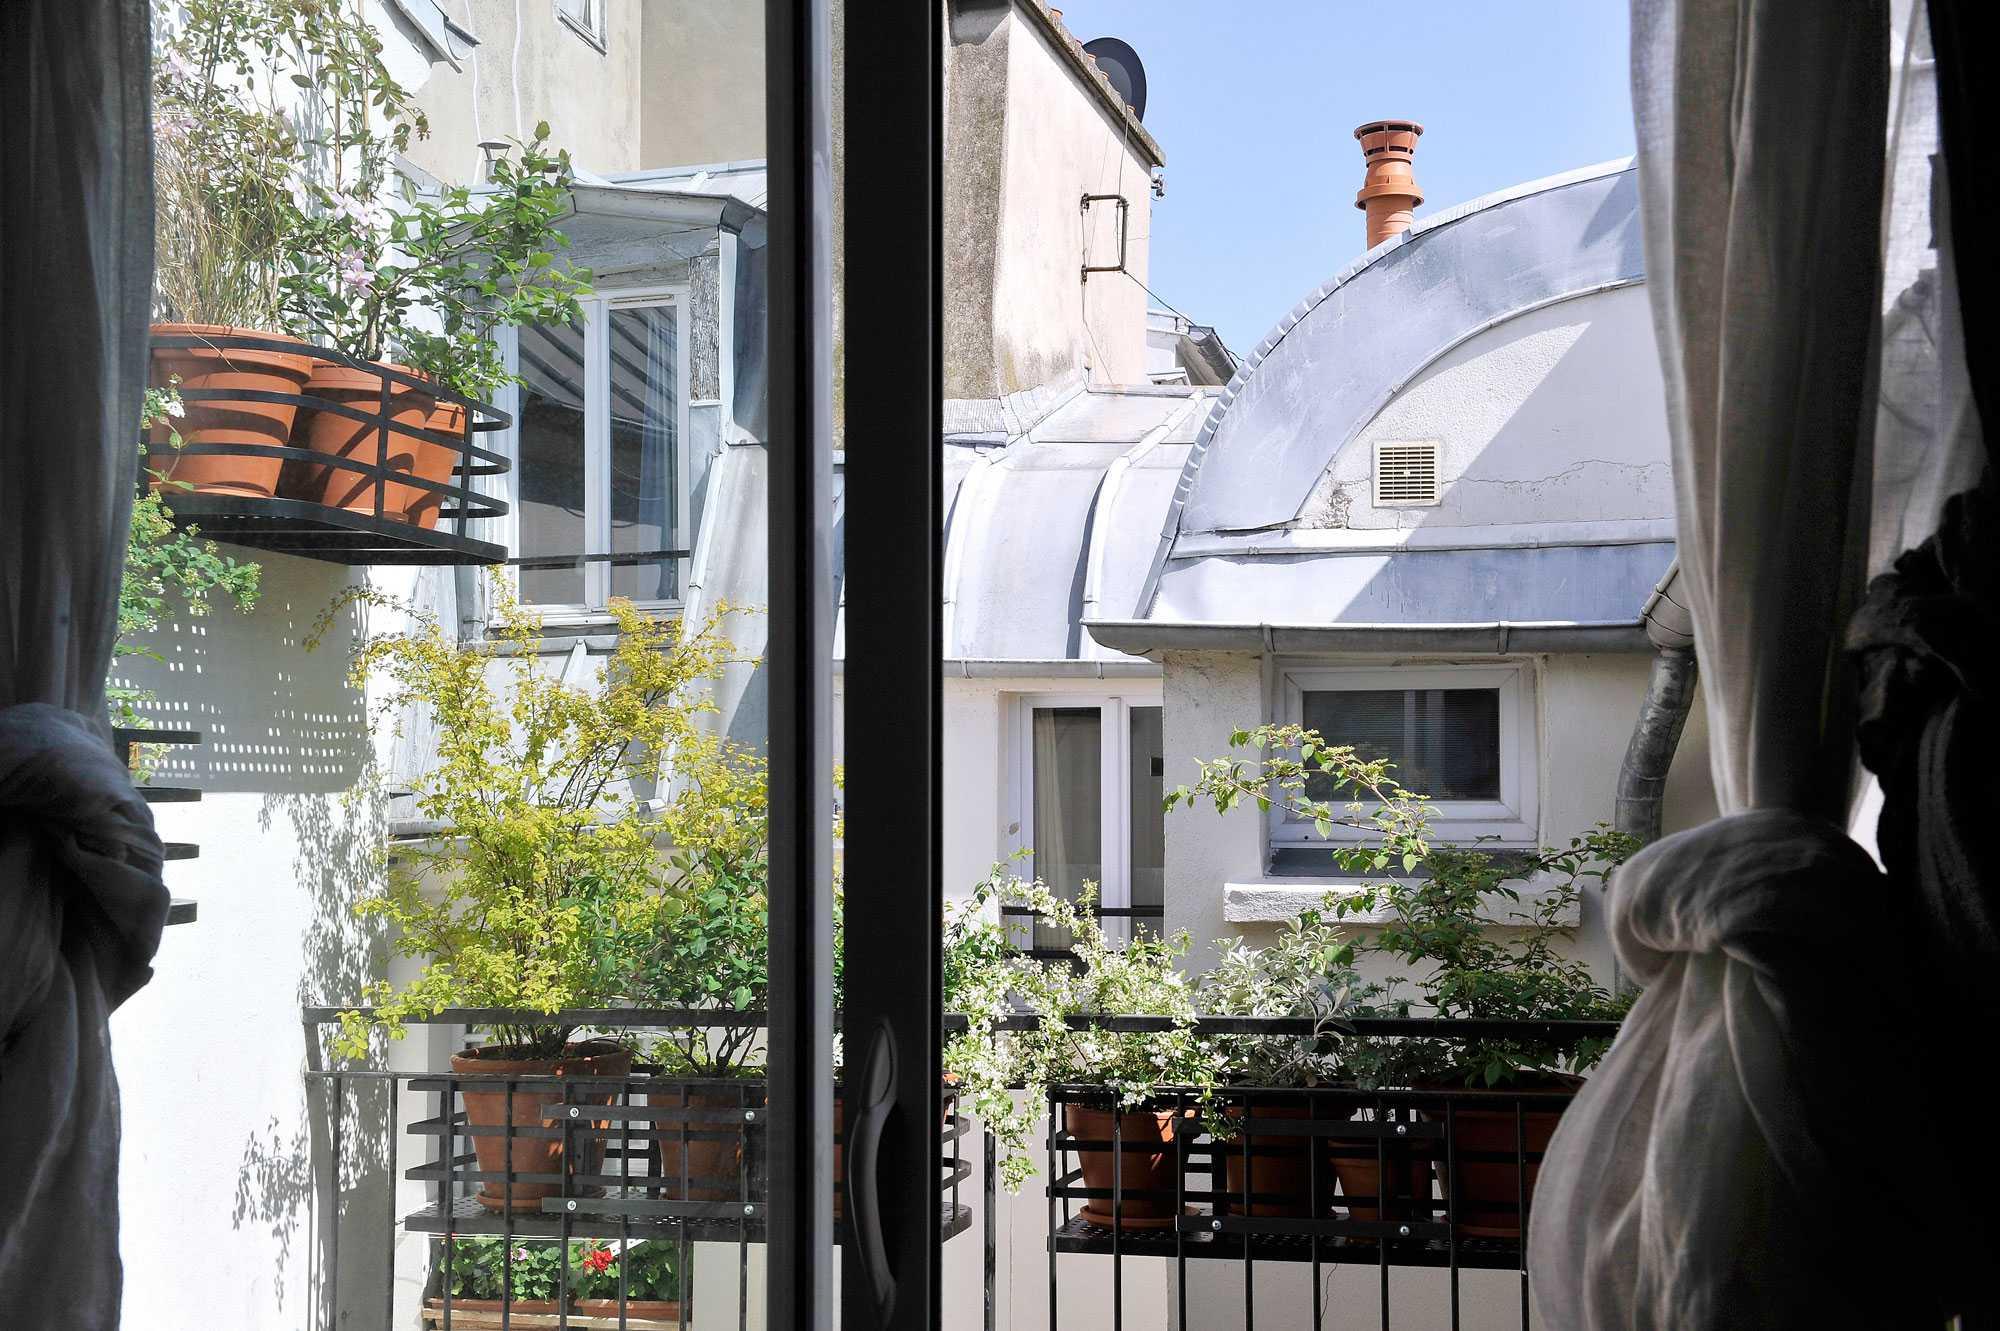 saintmartin 02 le vert soi. Black Bedroom Furniture Sets. Home Design Ideas